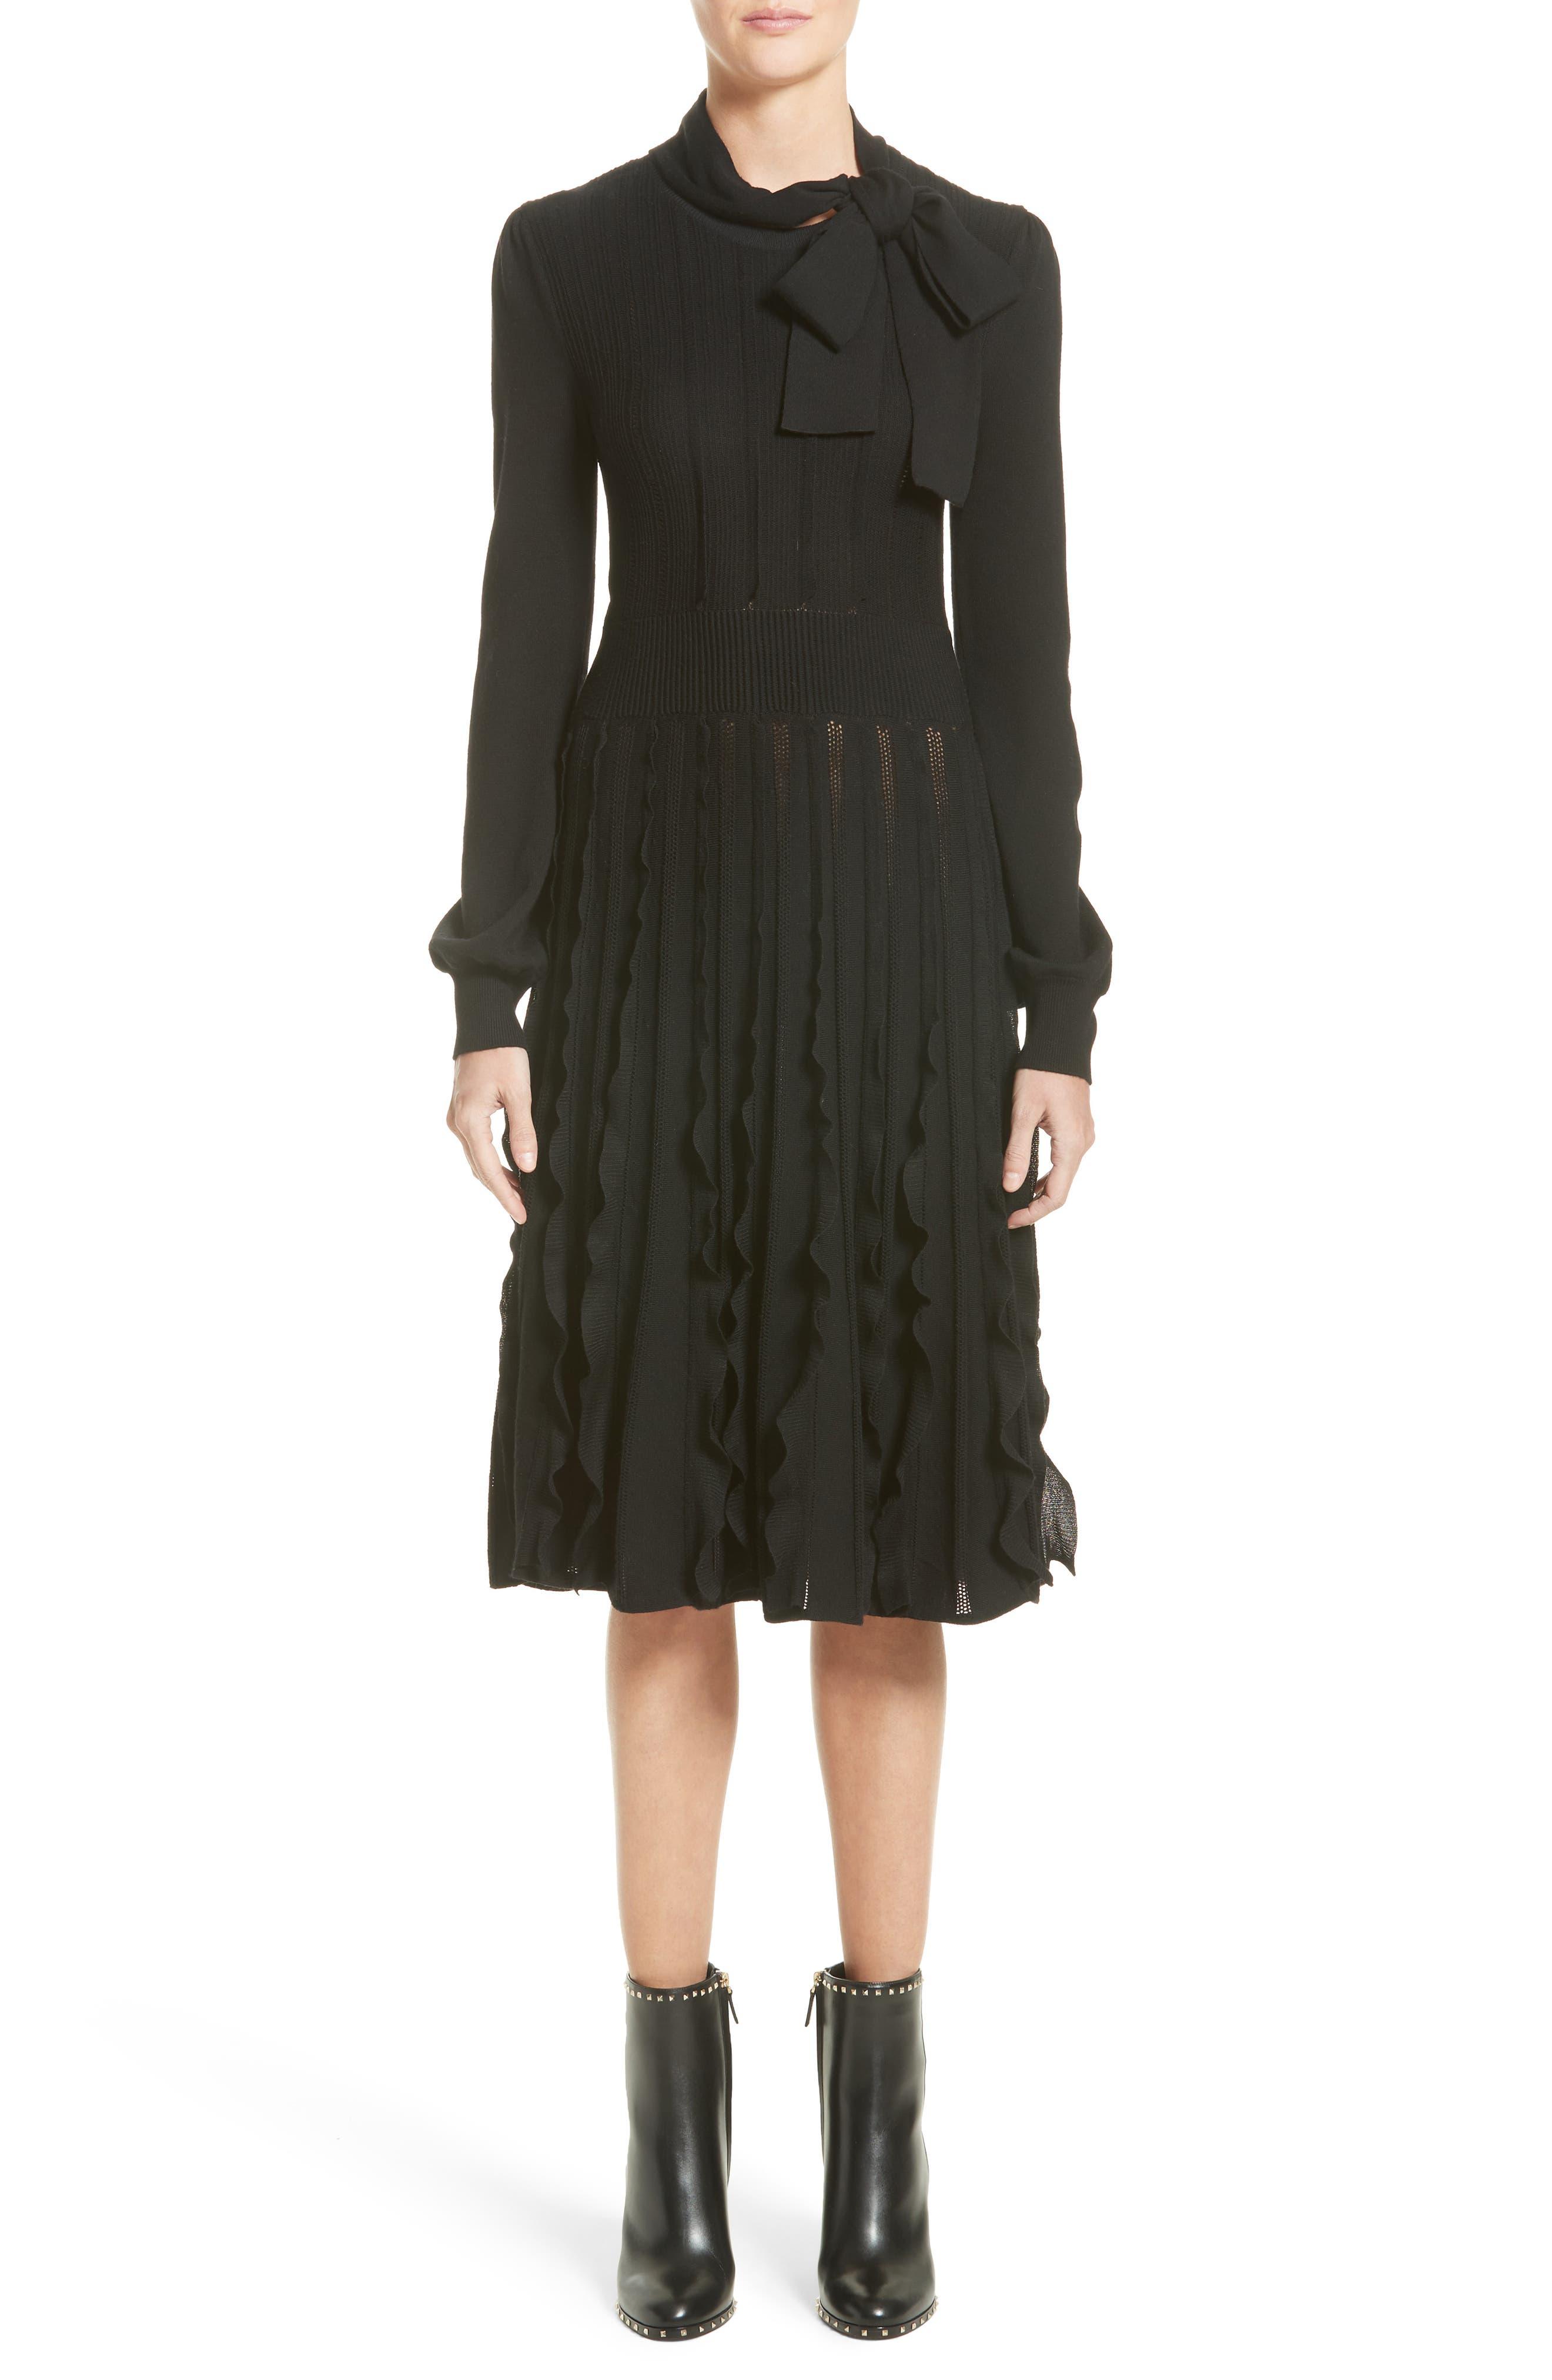 Ruffle Skirt Wool Knit Dress,                             Main thumbnail 1, color,                             001